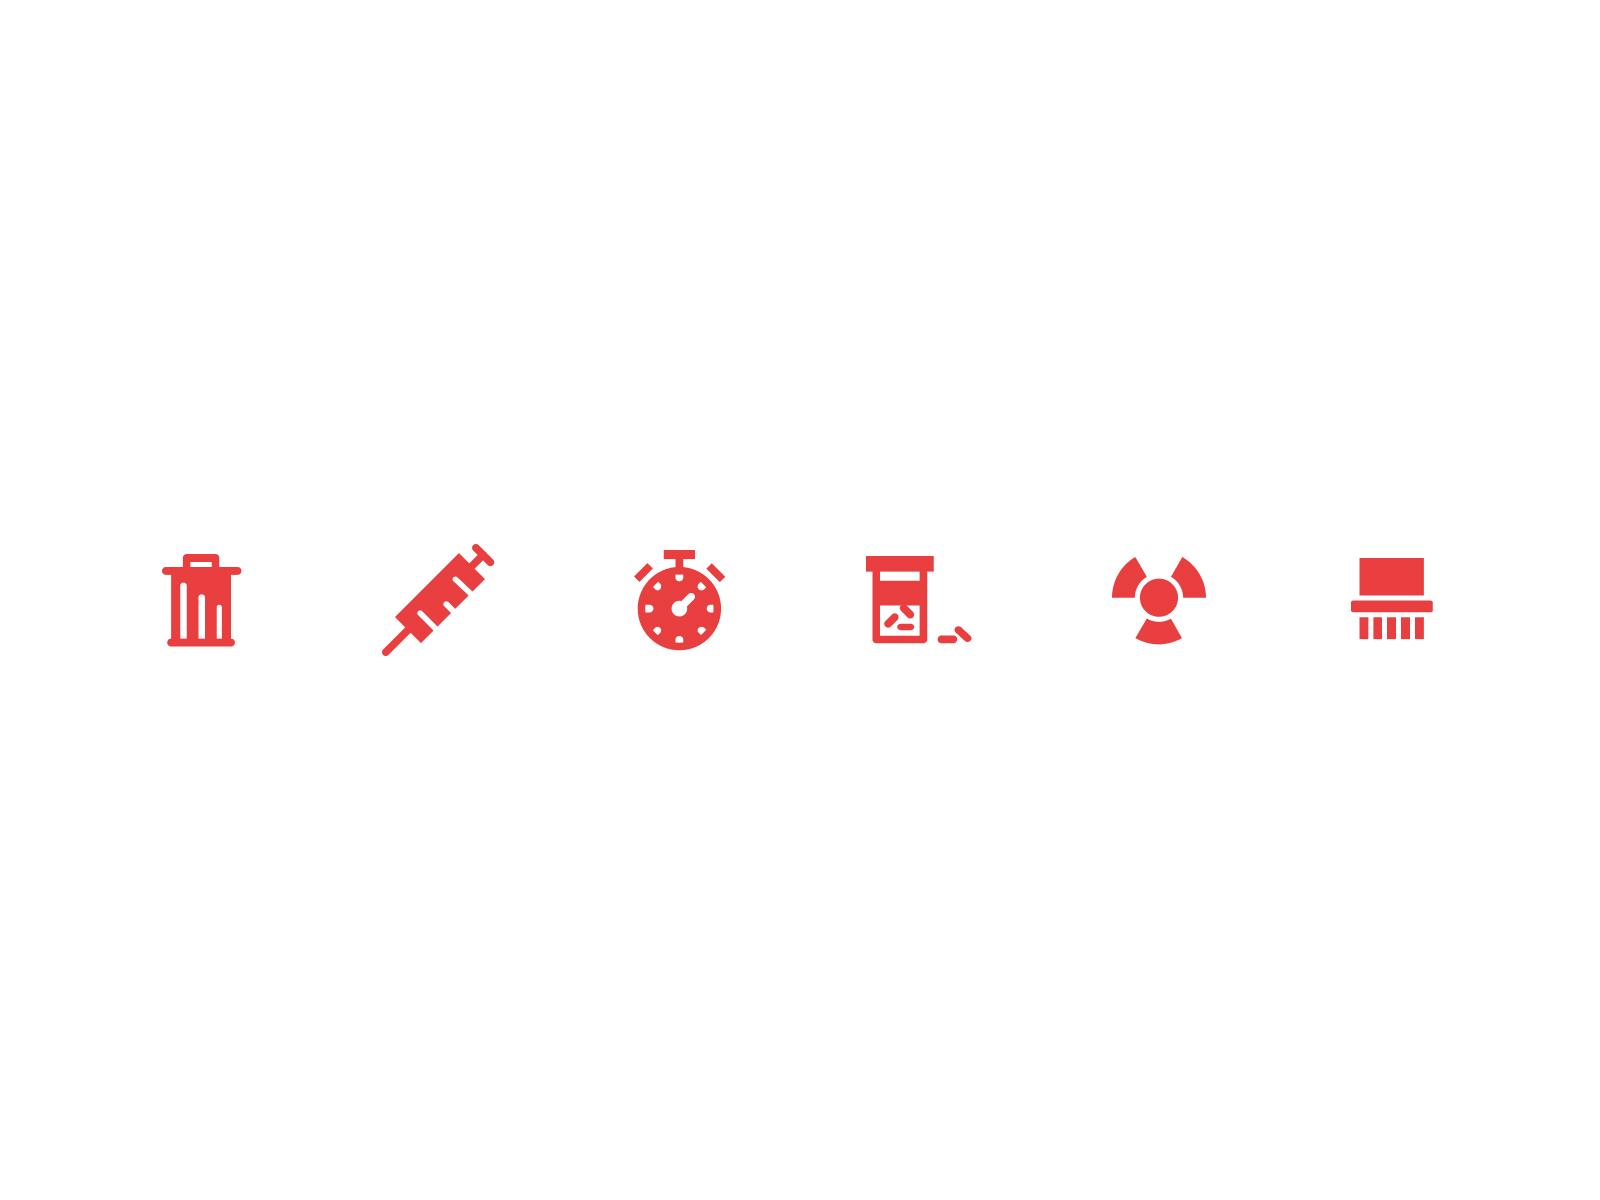 Redaway icons 2